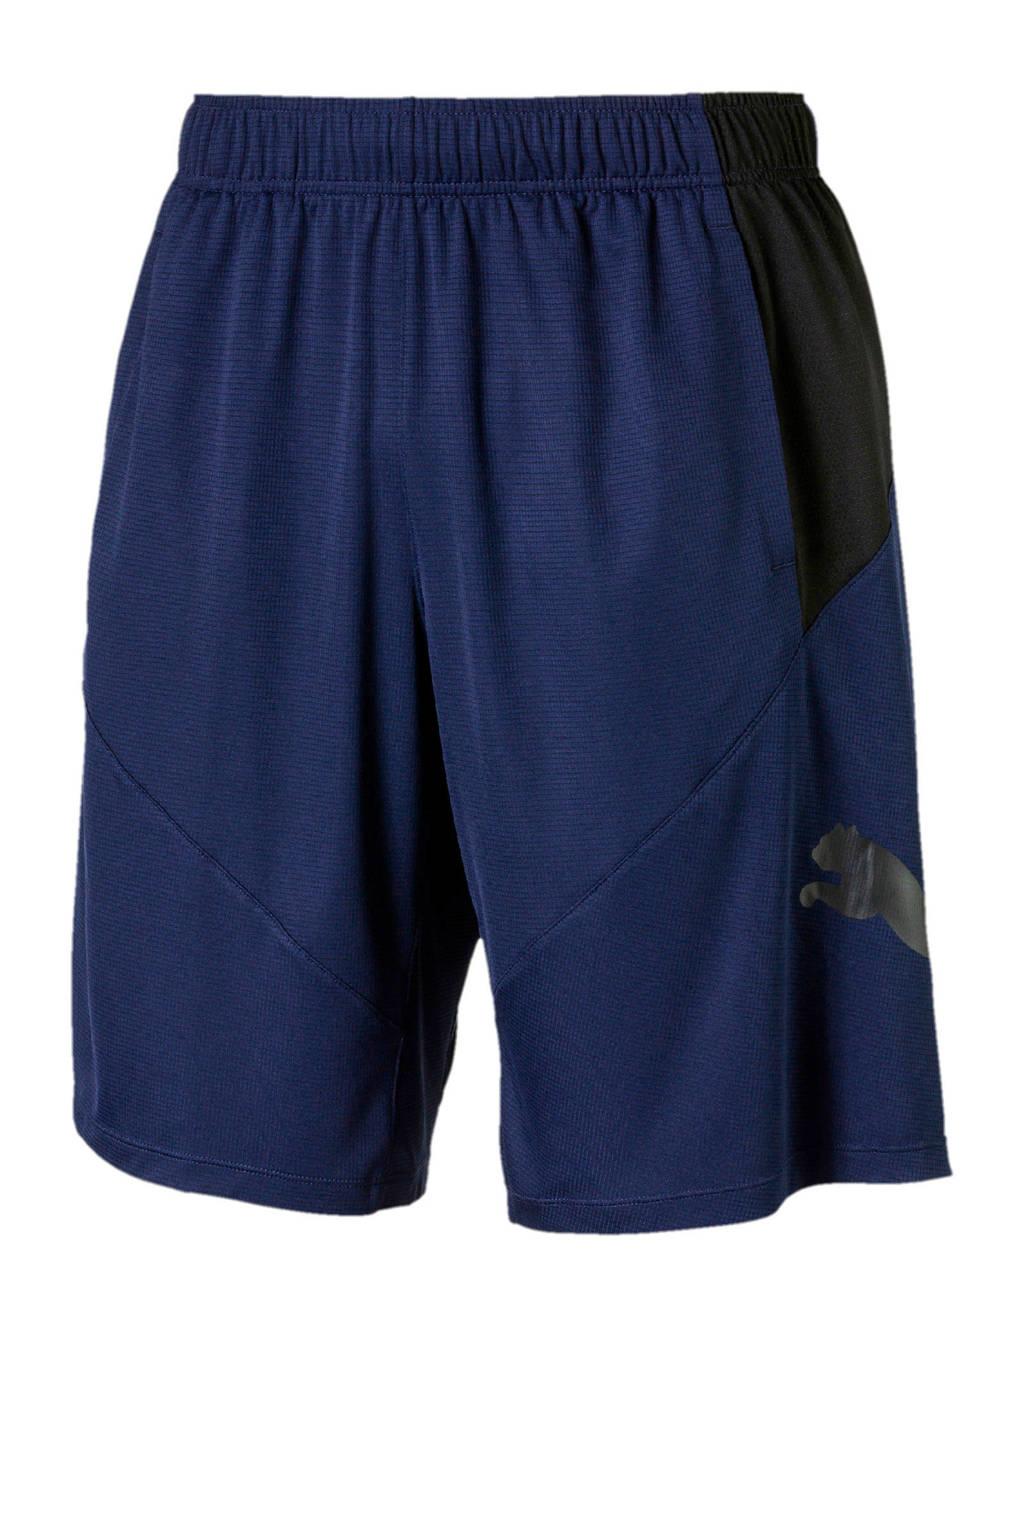 Puma   sportshort donkerblauw, Donkerblauw